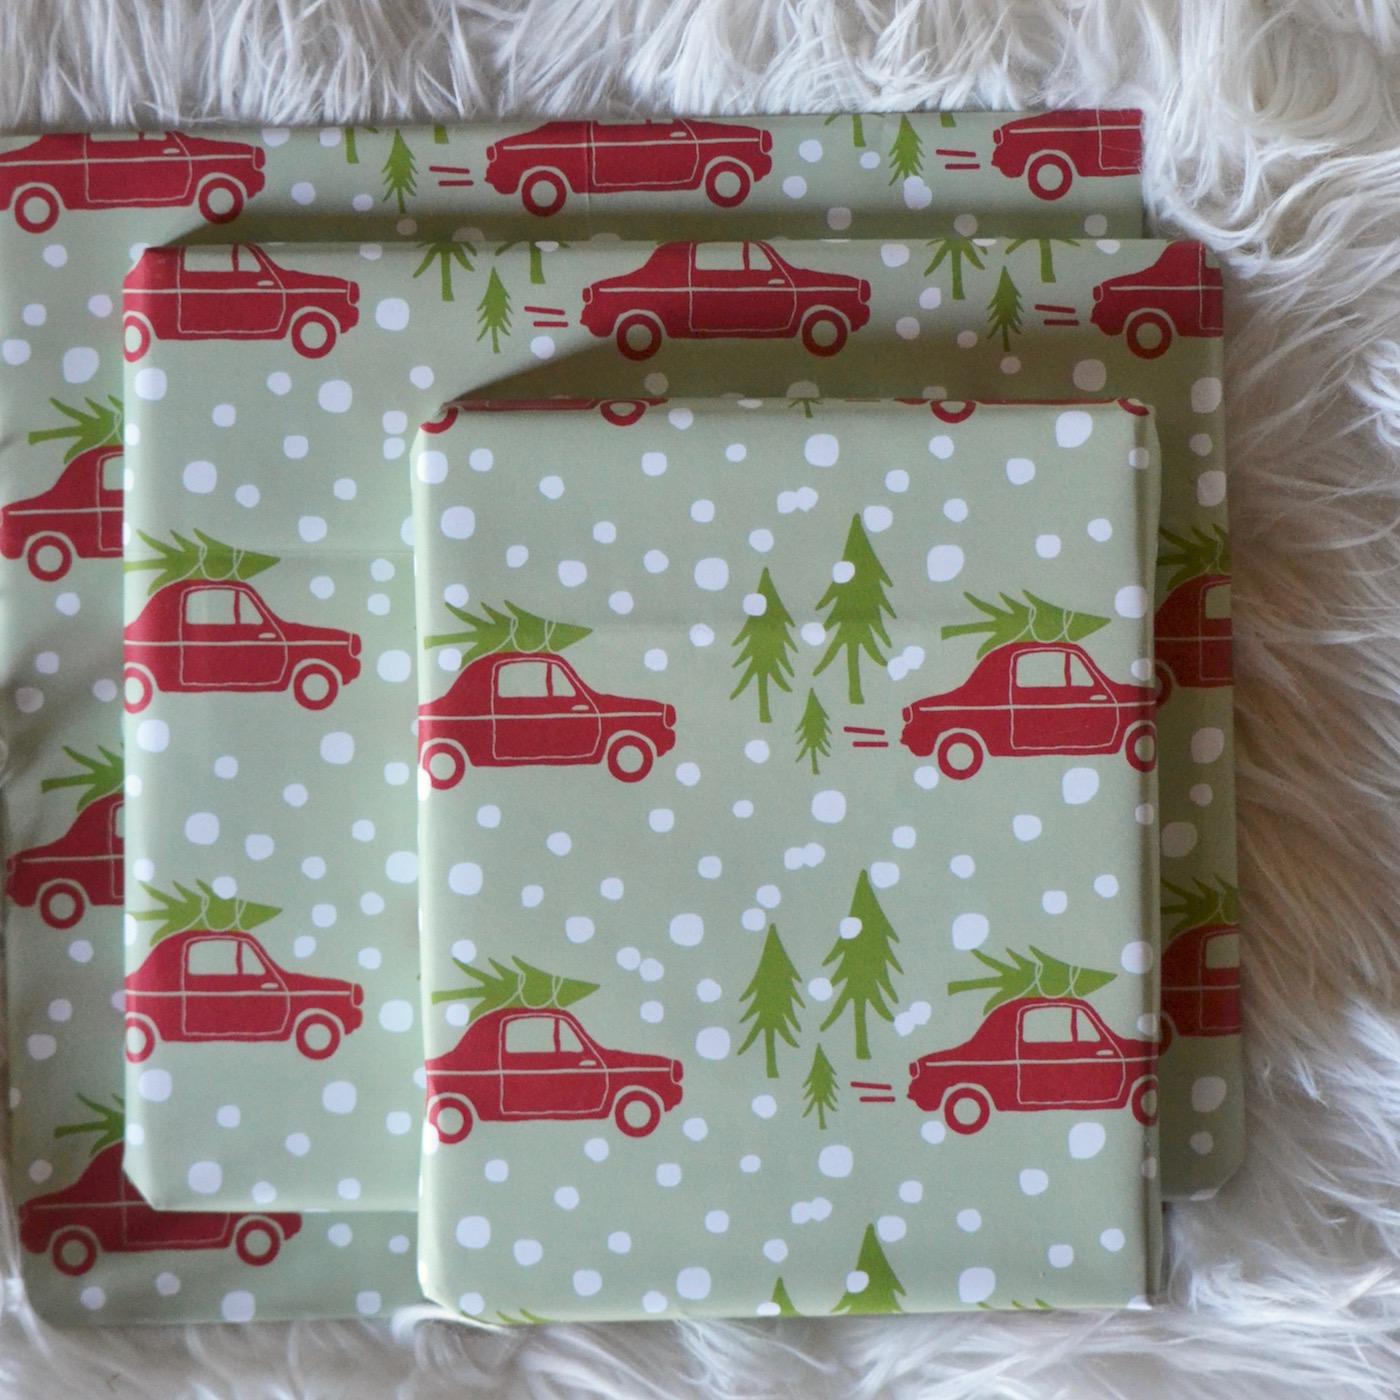 25 Christmas Books // www.thehiveblog.com